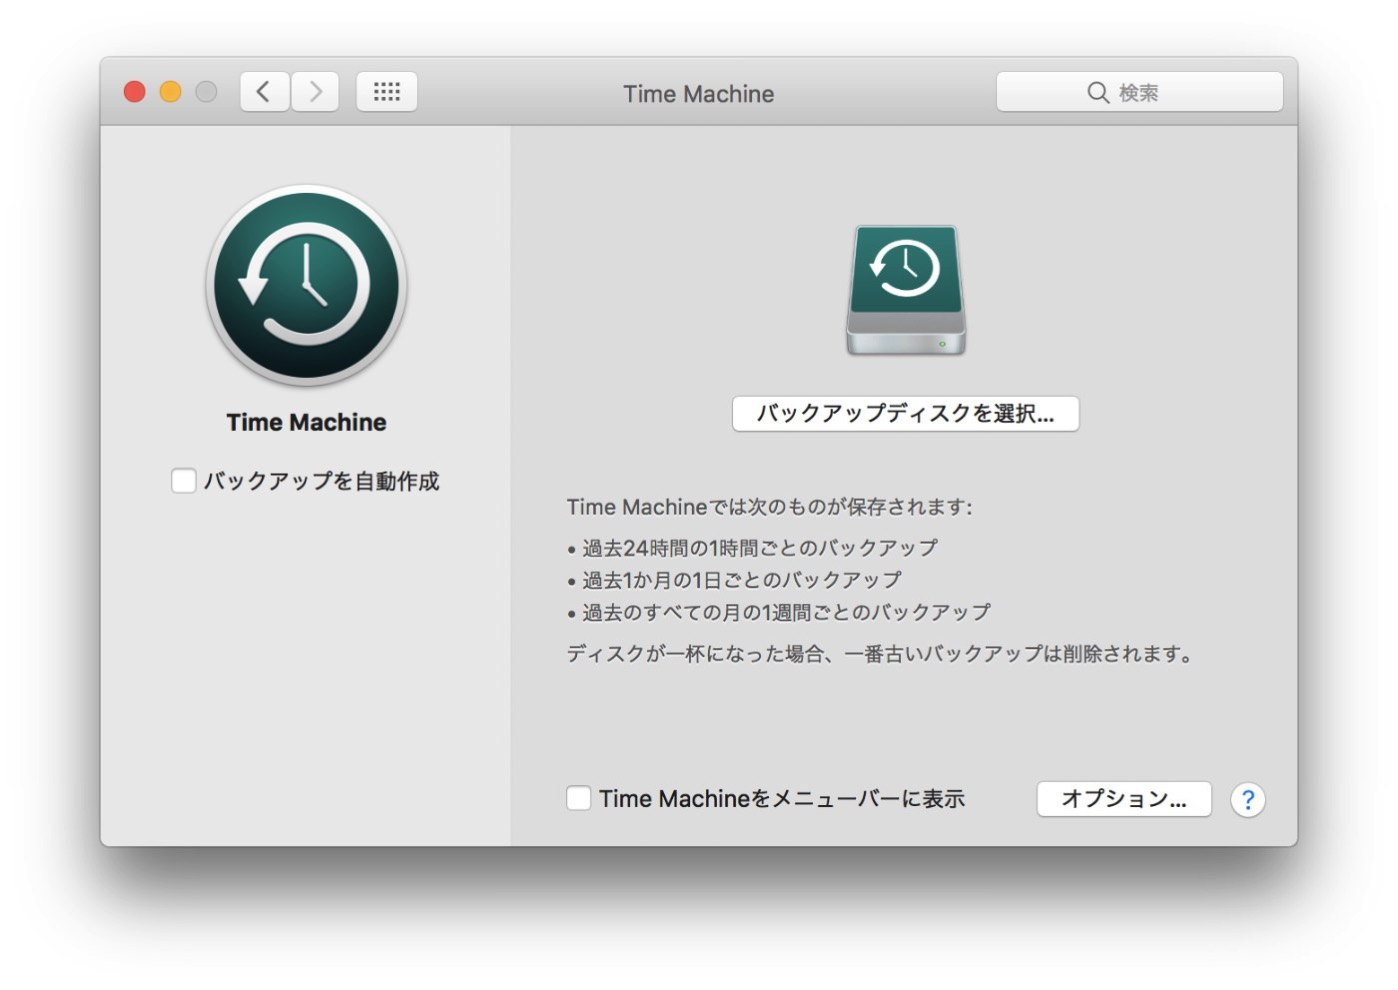 MacBook Pro 15 Backup-8